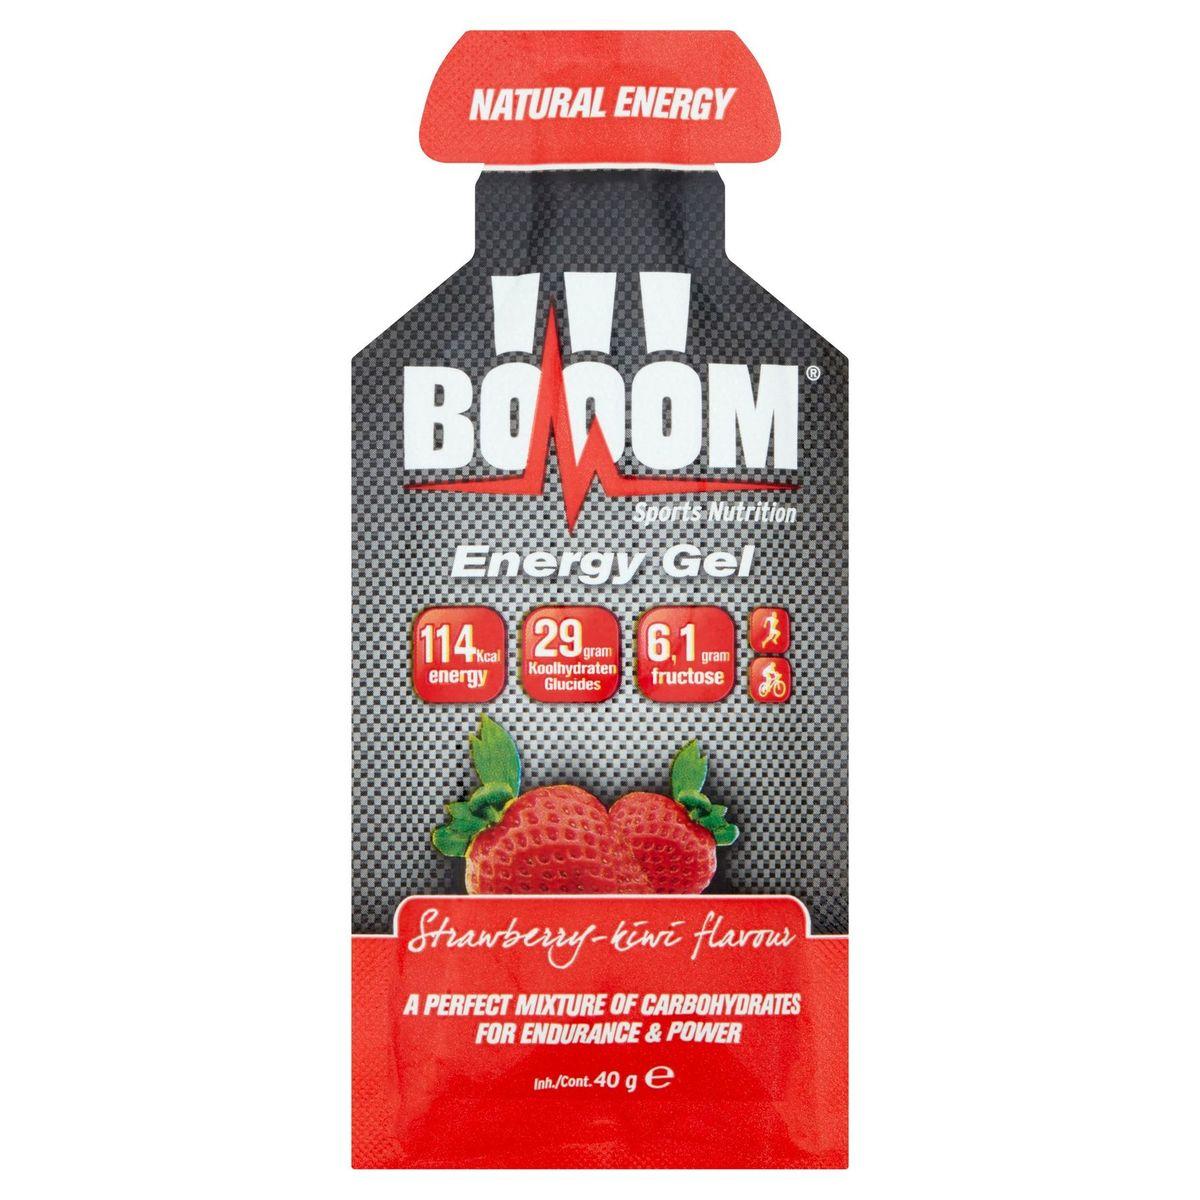 Booom Energy Gel Strawberry - Kiwi Flavour 40 g